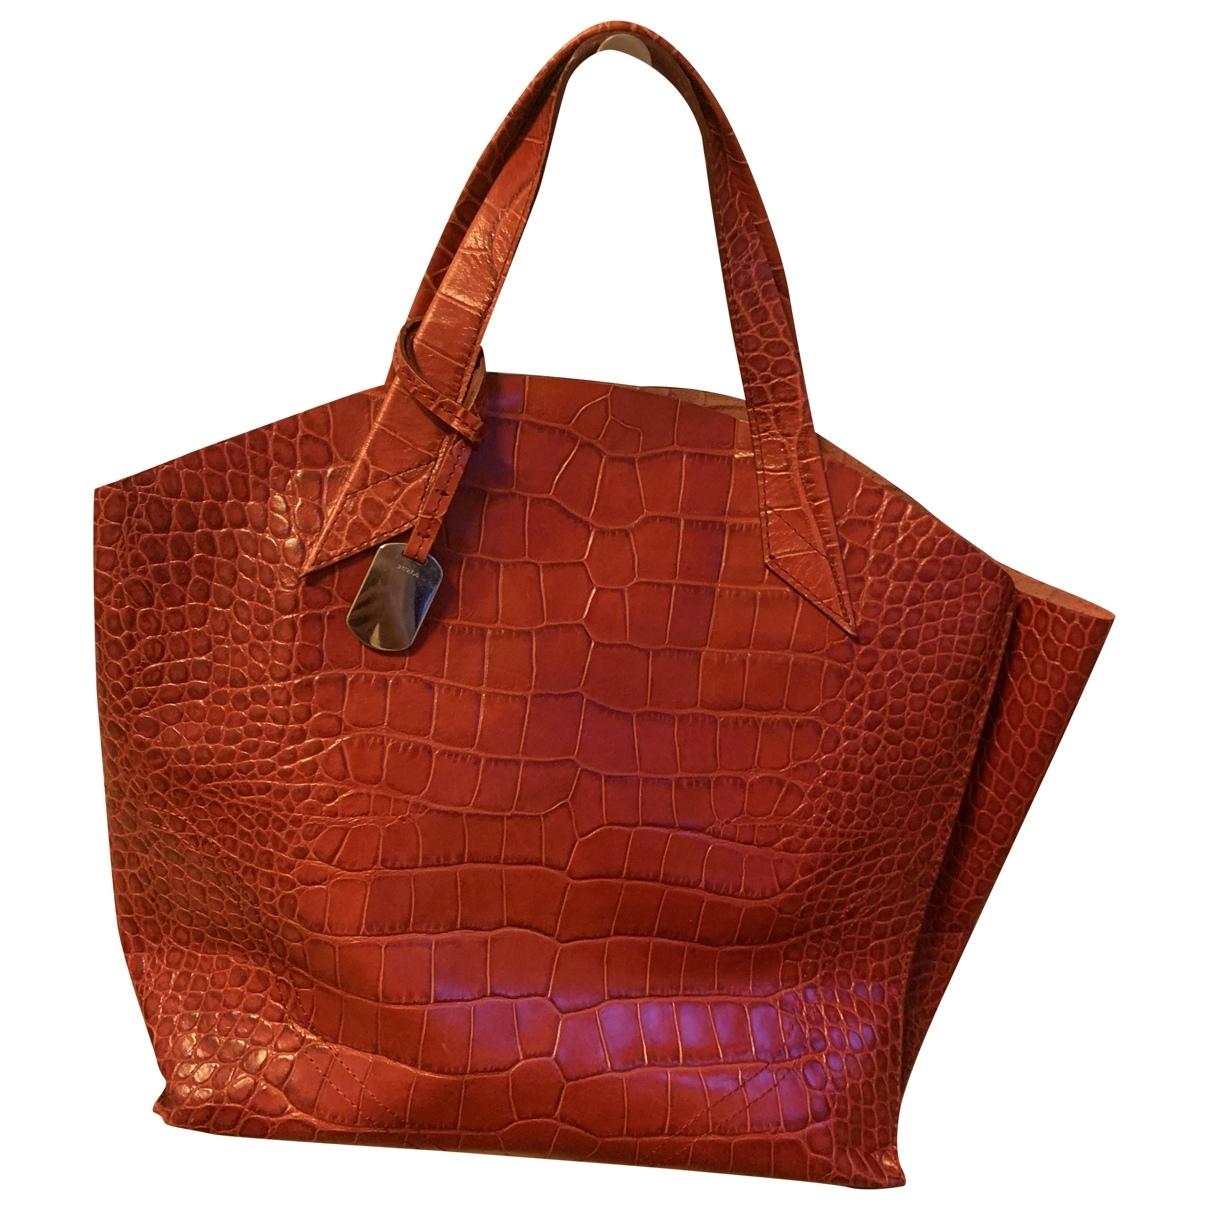 Furla \N Red Leather handbag for Women \N